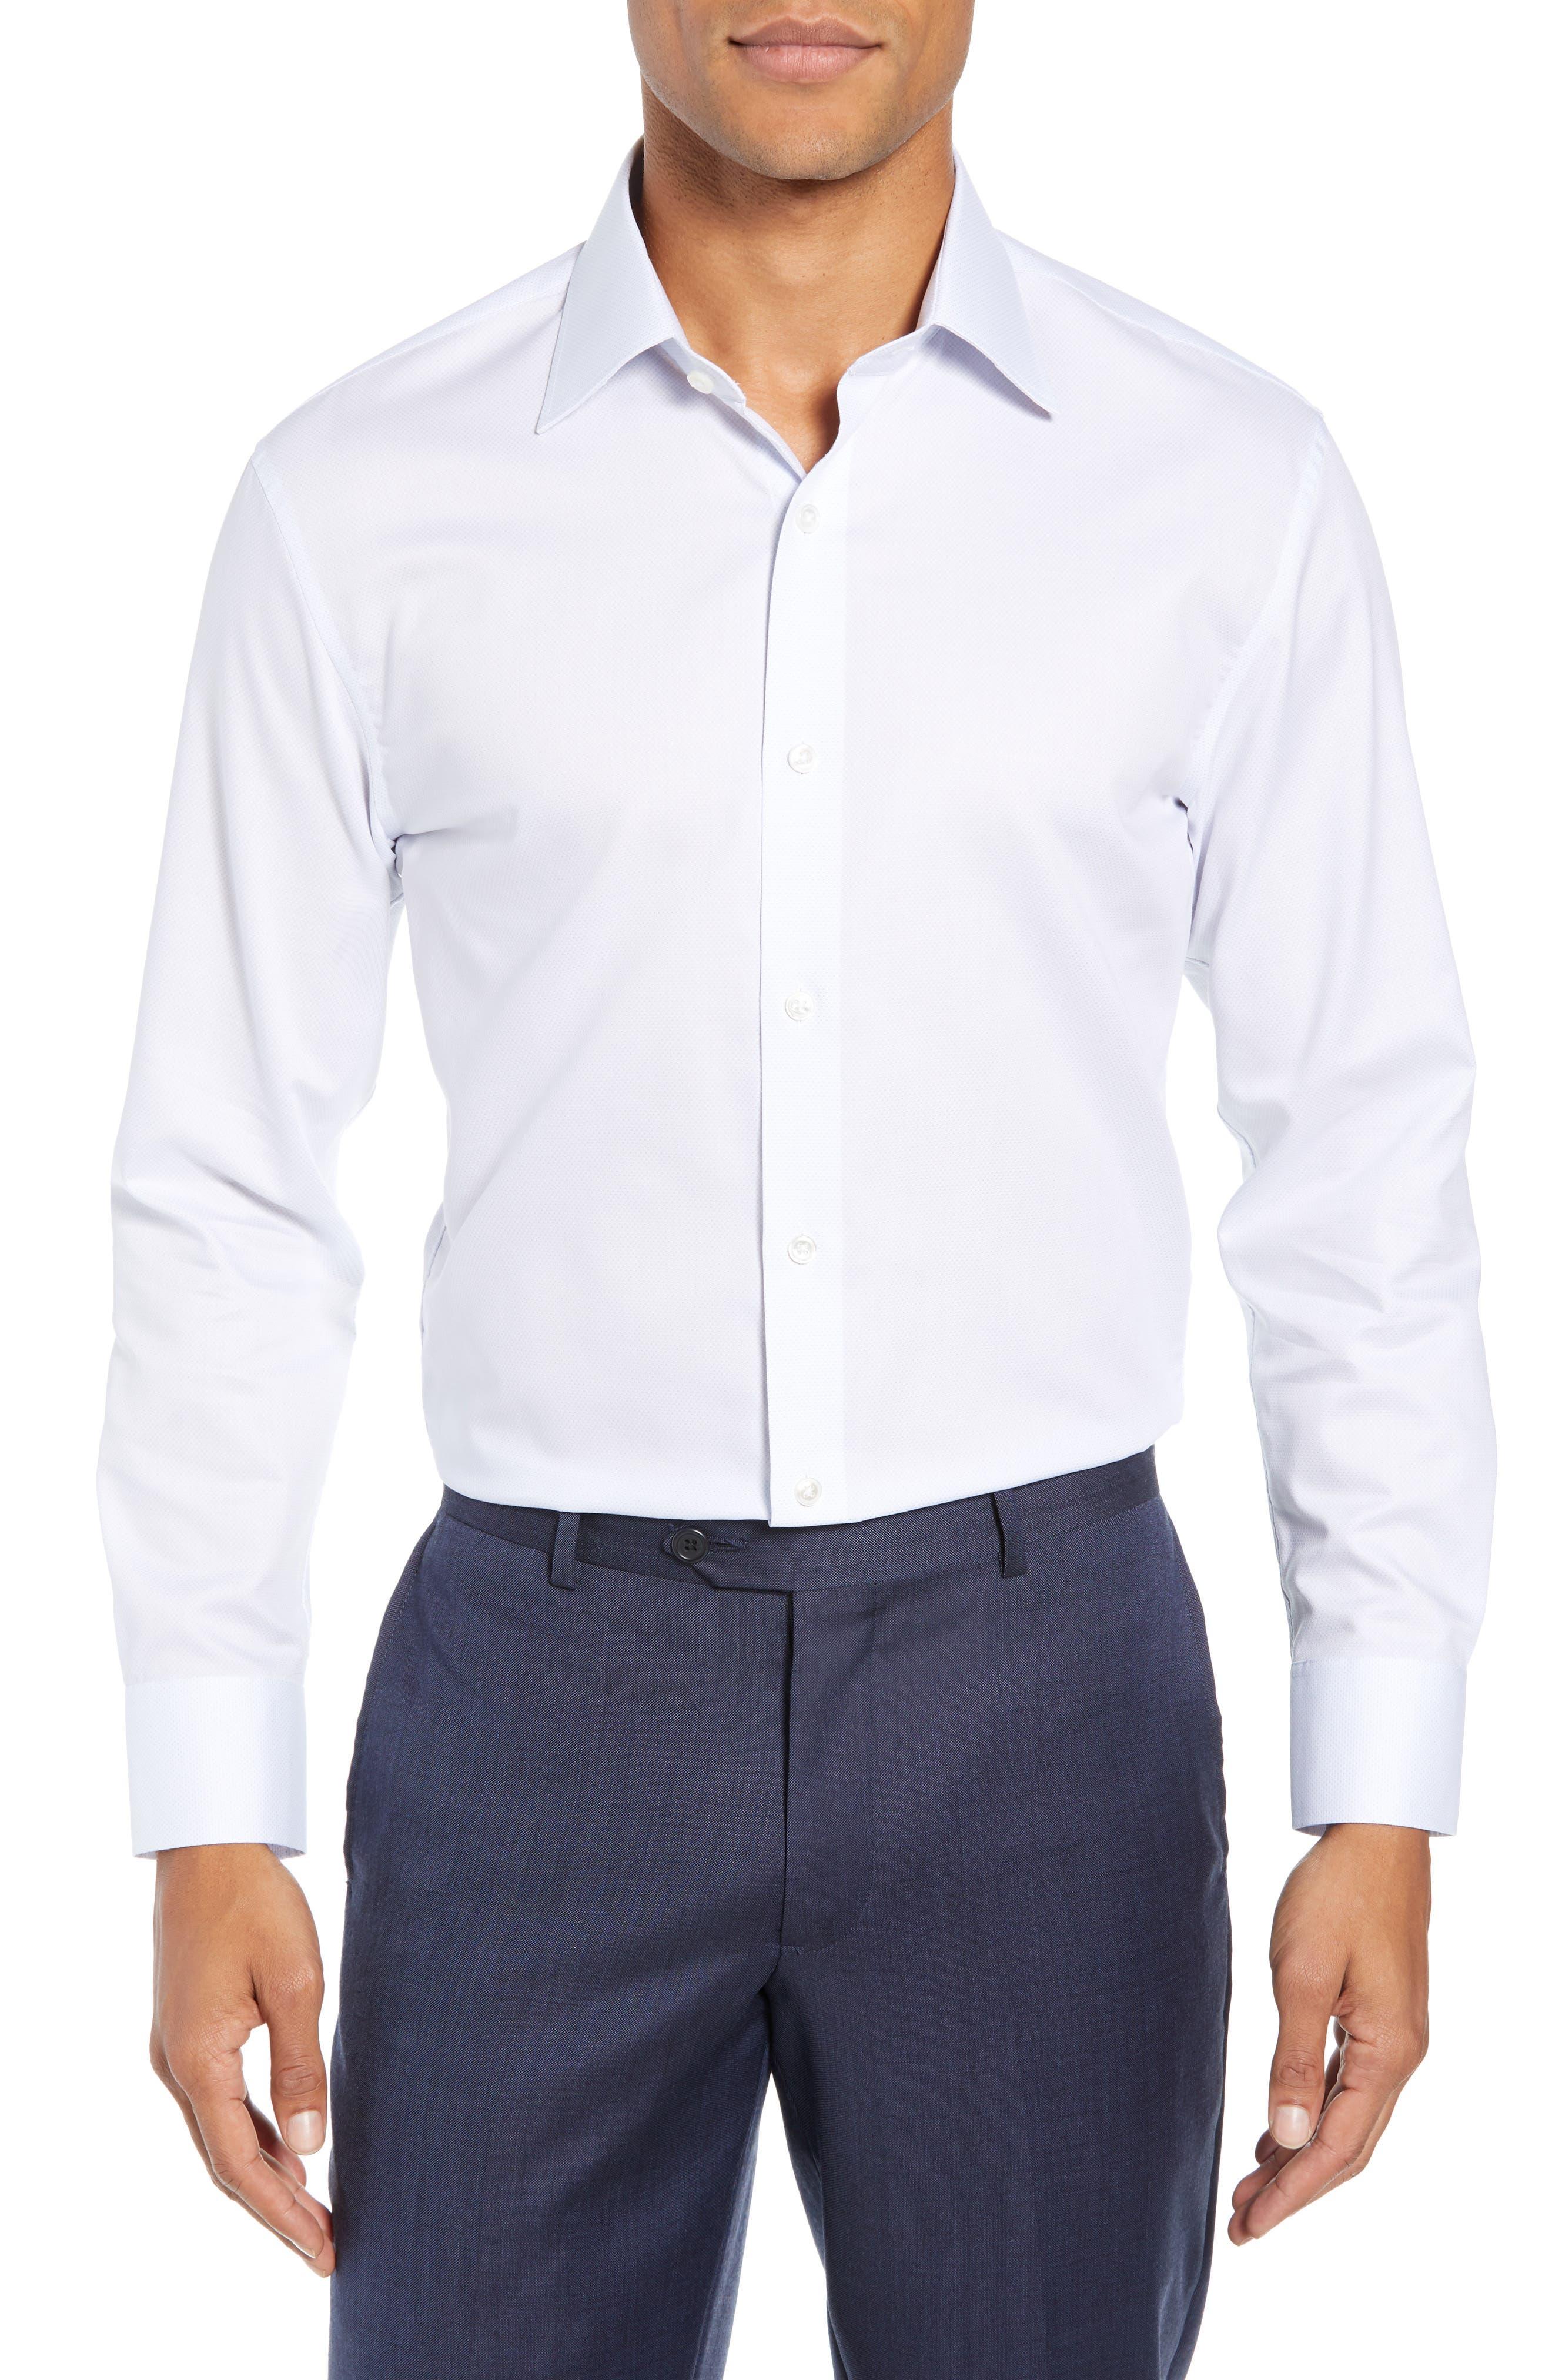 Swiss Performance Slim Fit Solid Dress Shirt,                         Main,                         color, SOFT BLUE